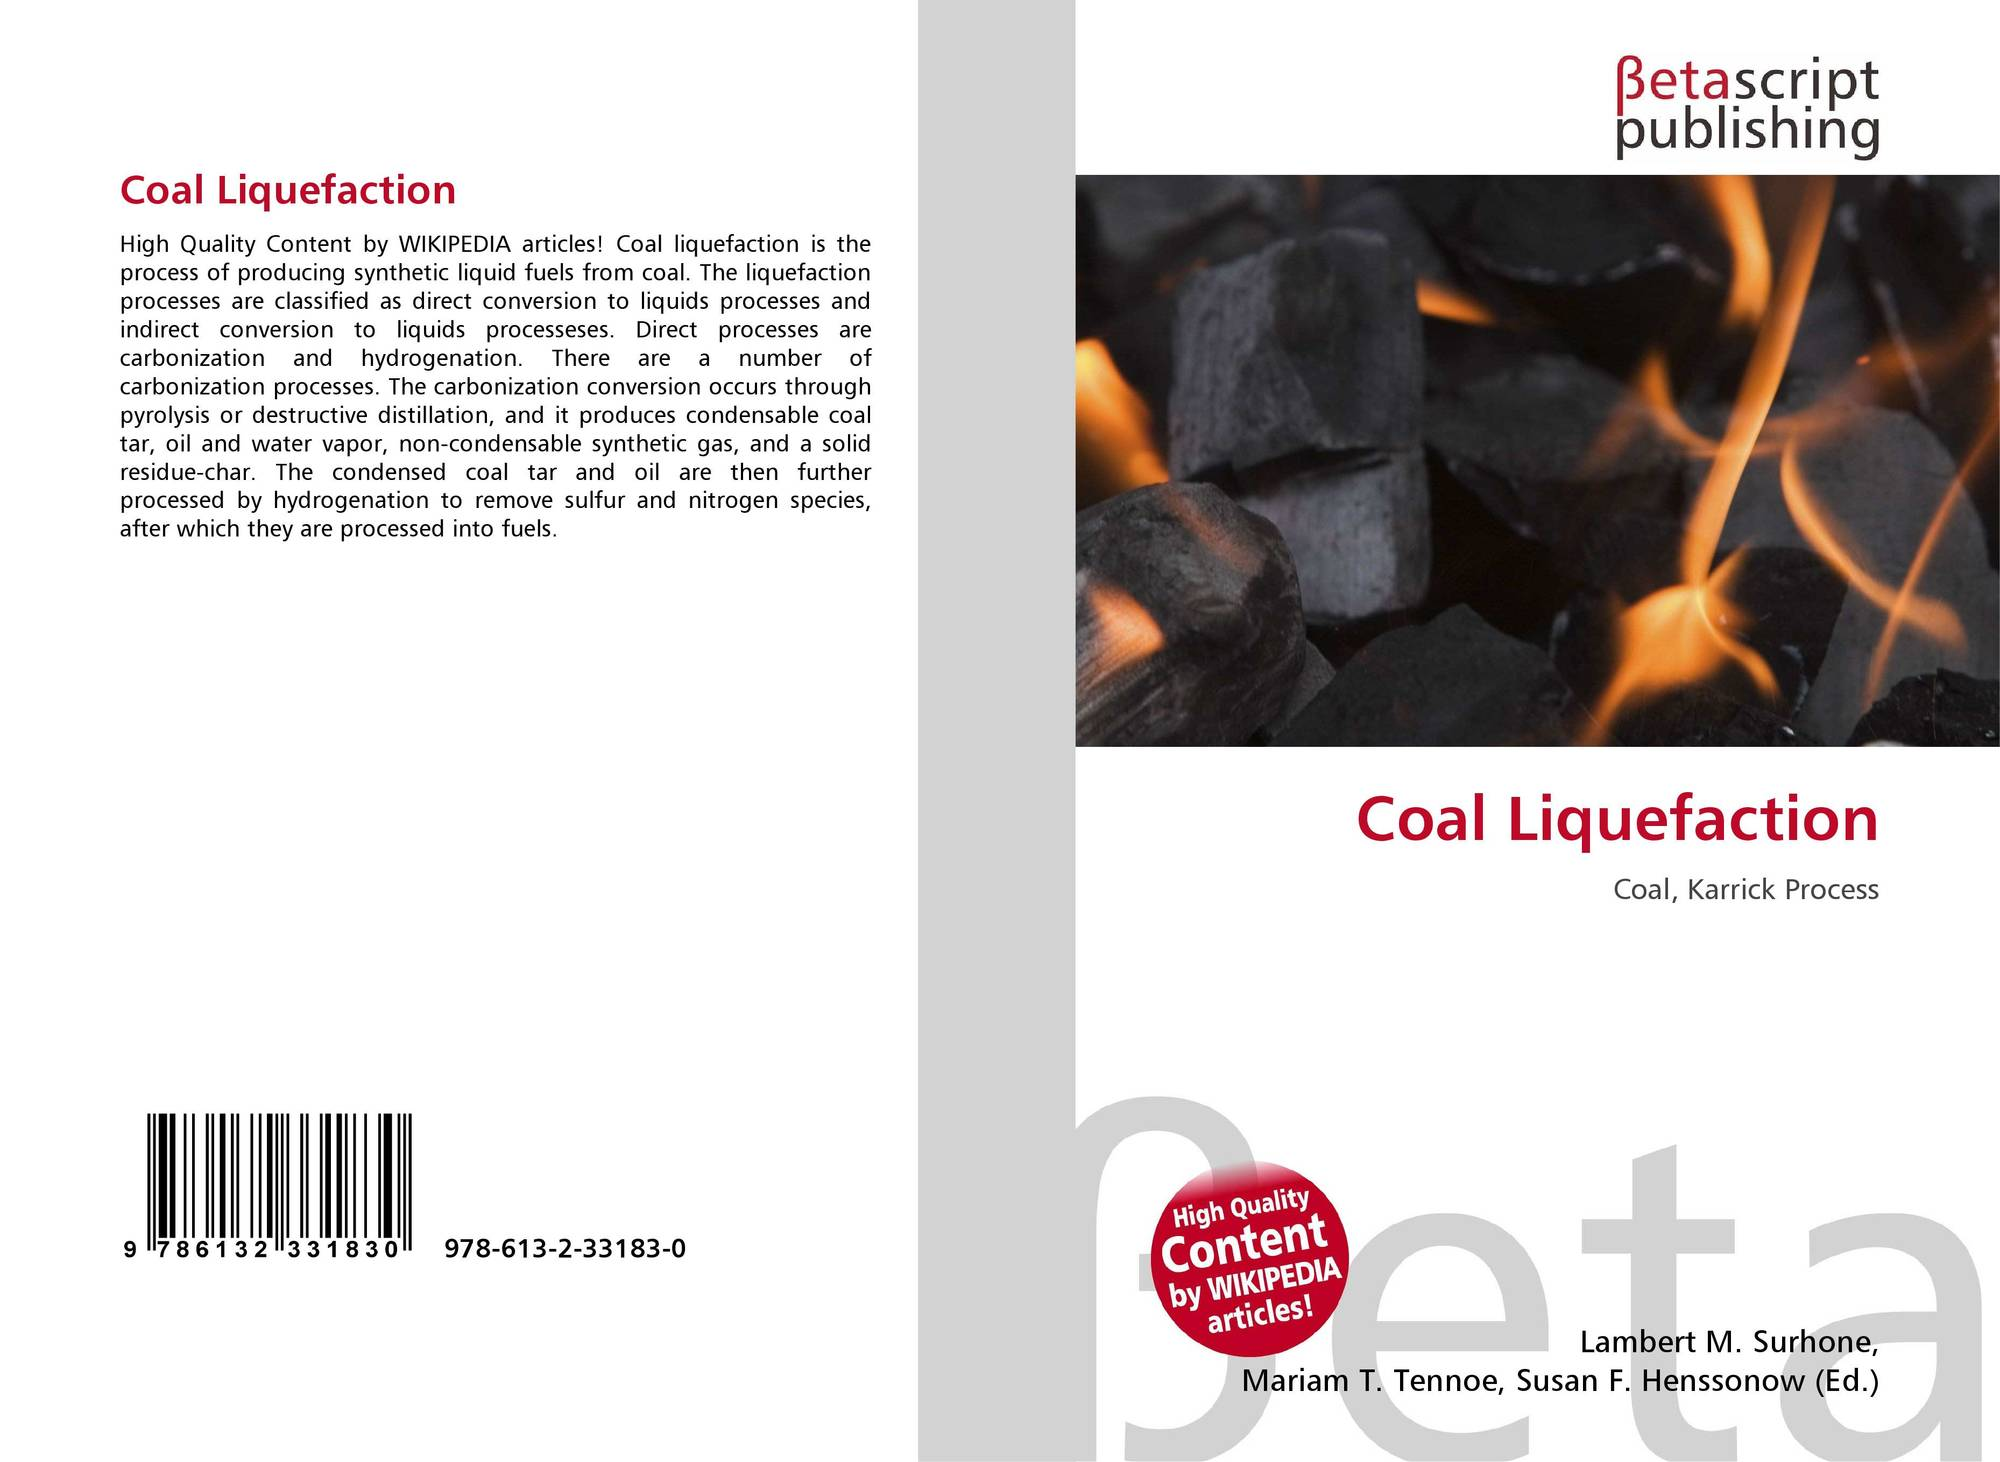 Coal Liquefaction, 978-613-2-33183-0, 6132331832 ,9786132331830